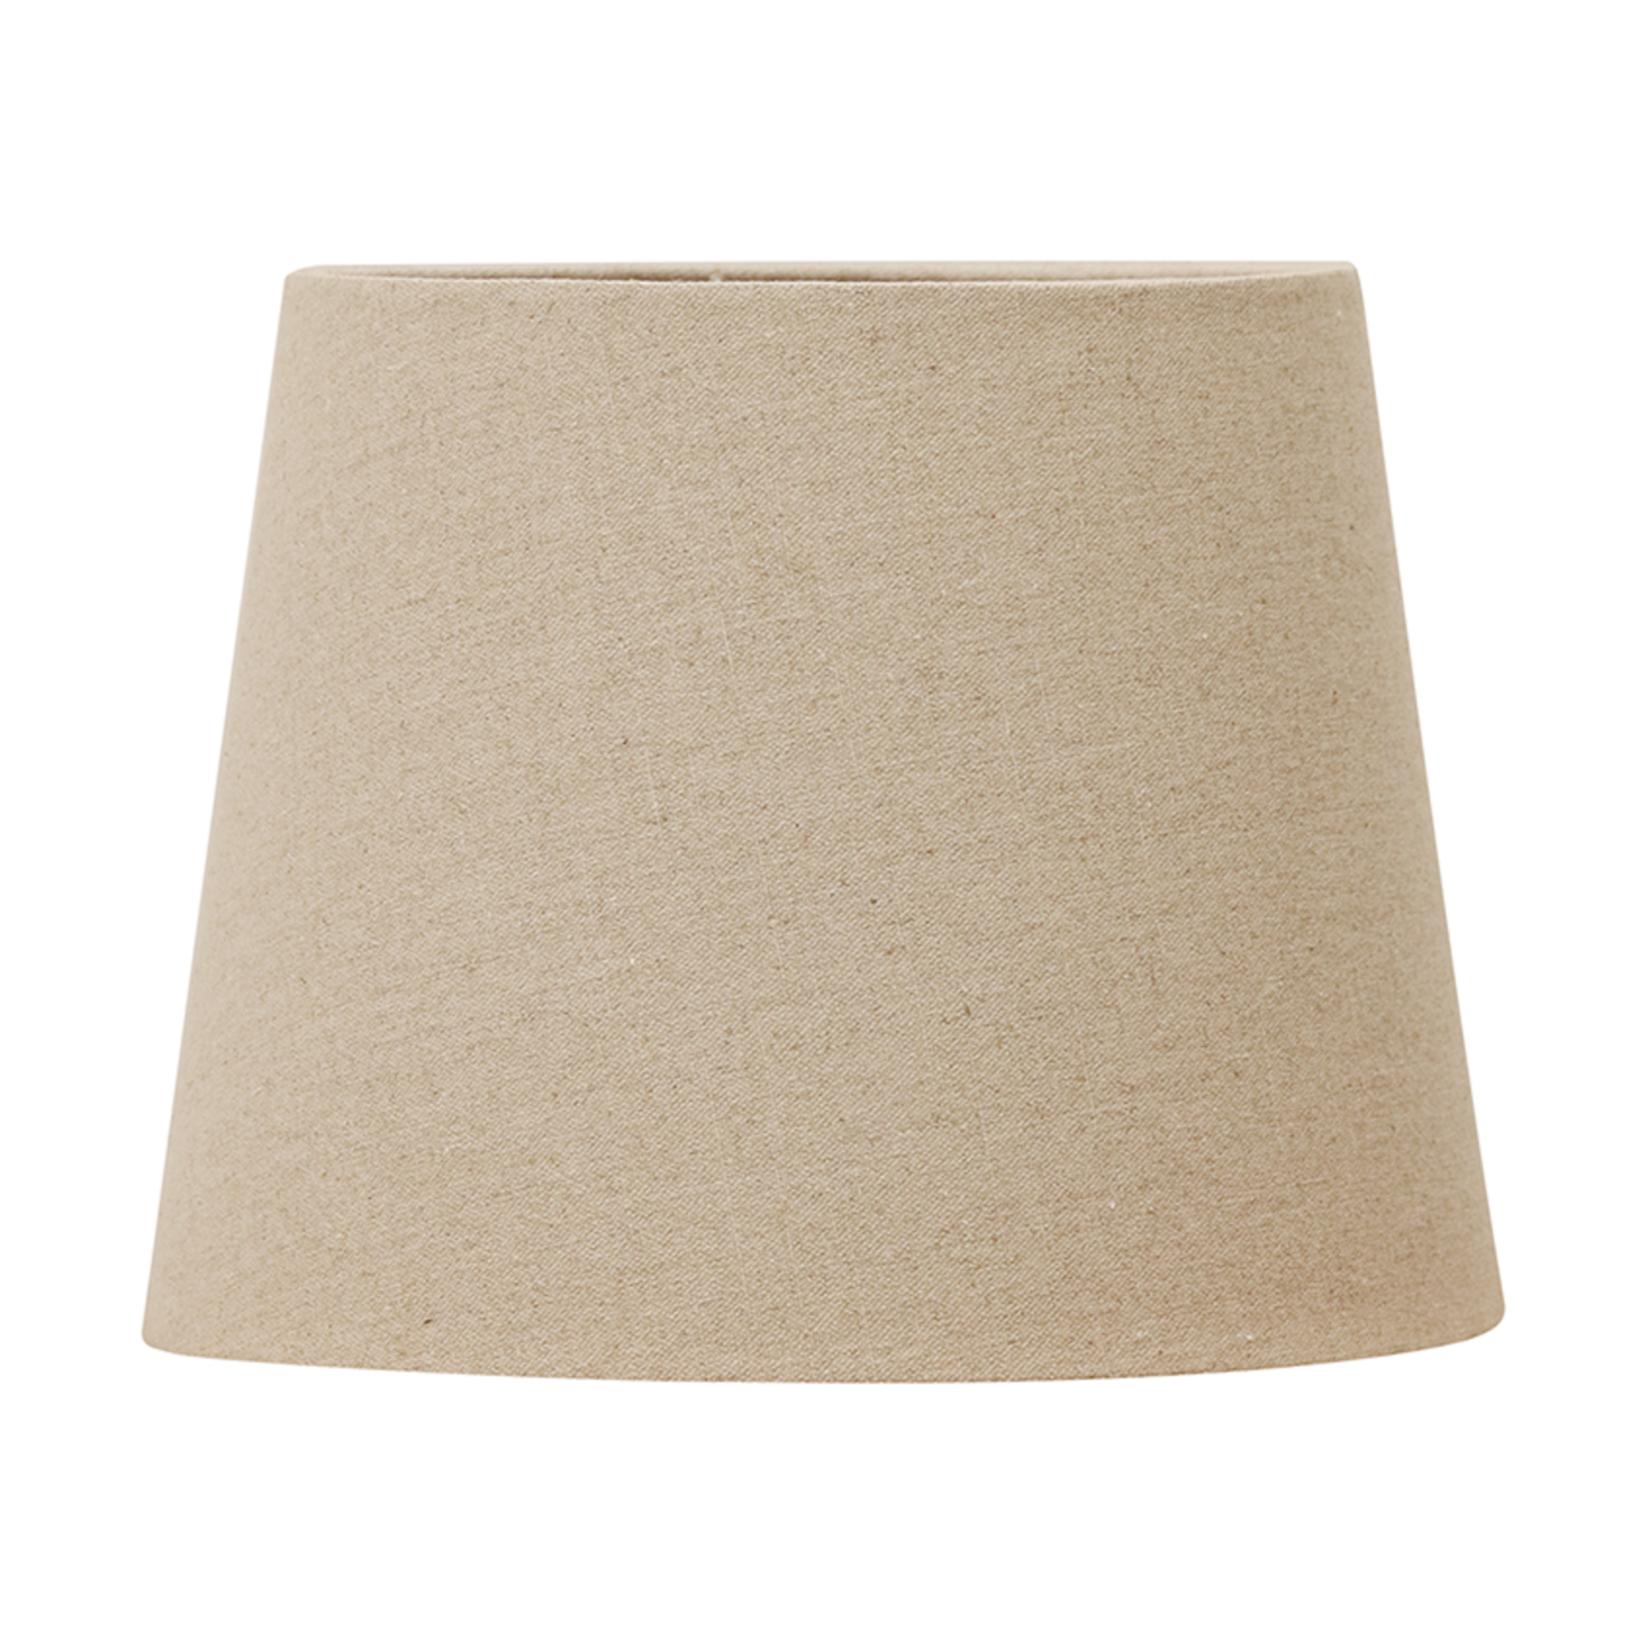 CC Interiors Raw Linen Tall Drum